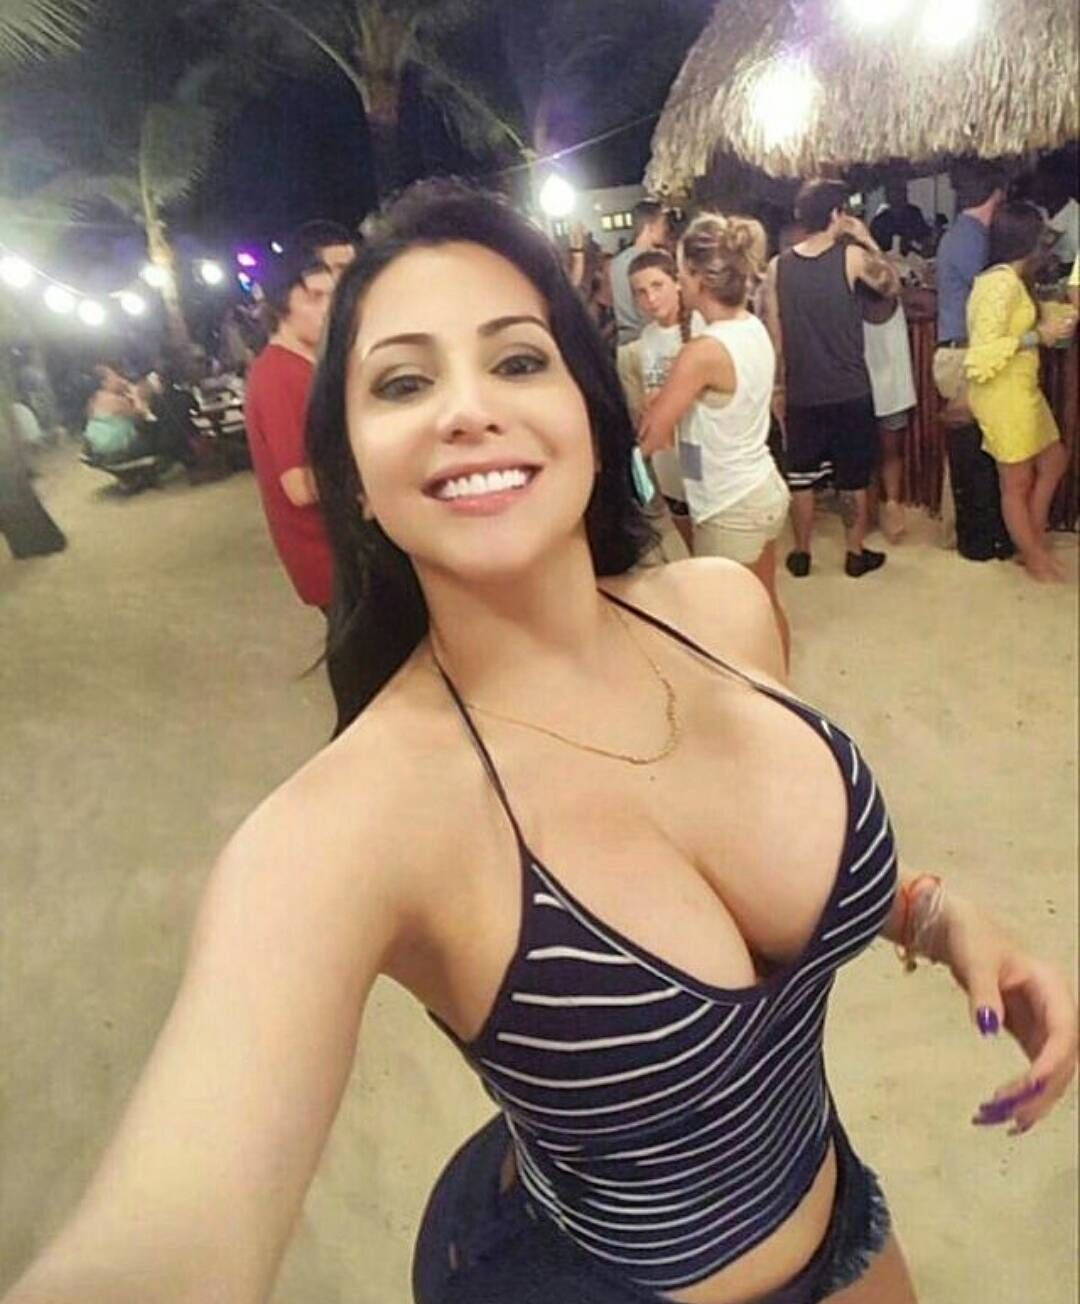 Alexa Minor On Instagram Latinas Sexis Colombia Paisas Calenas Pereira Model Love Sexigirl Fantasia Girls Honey Fitness Modelsfitness